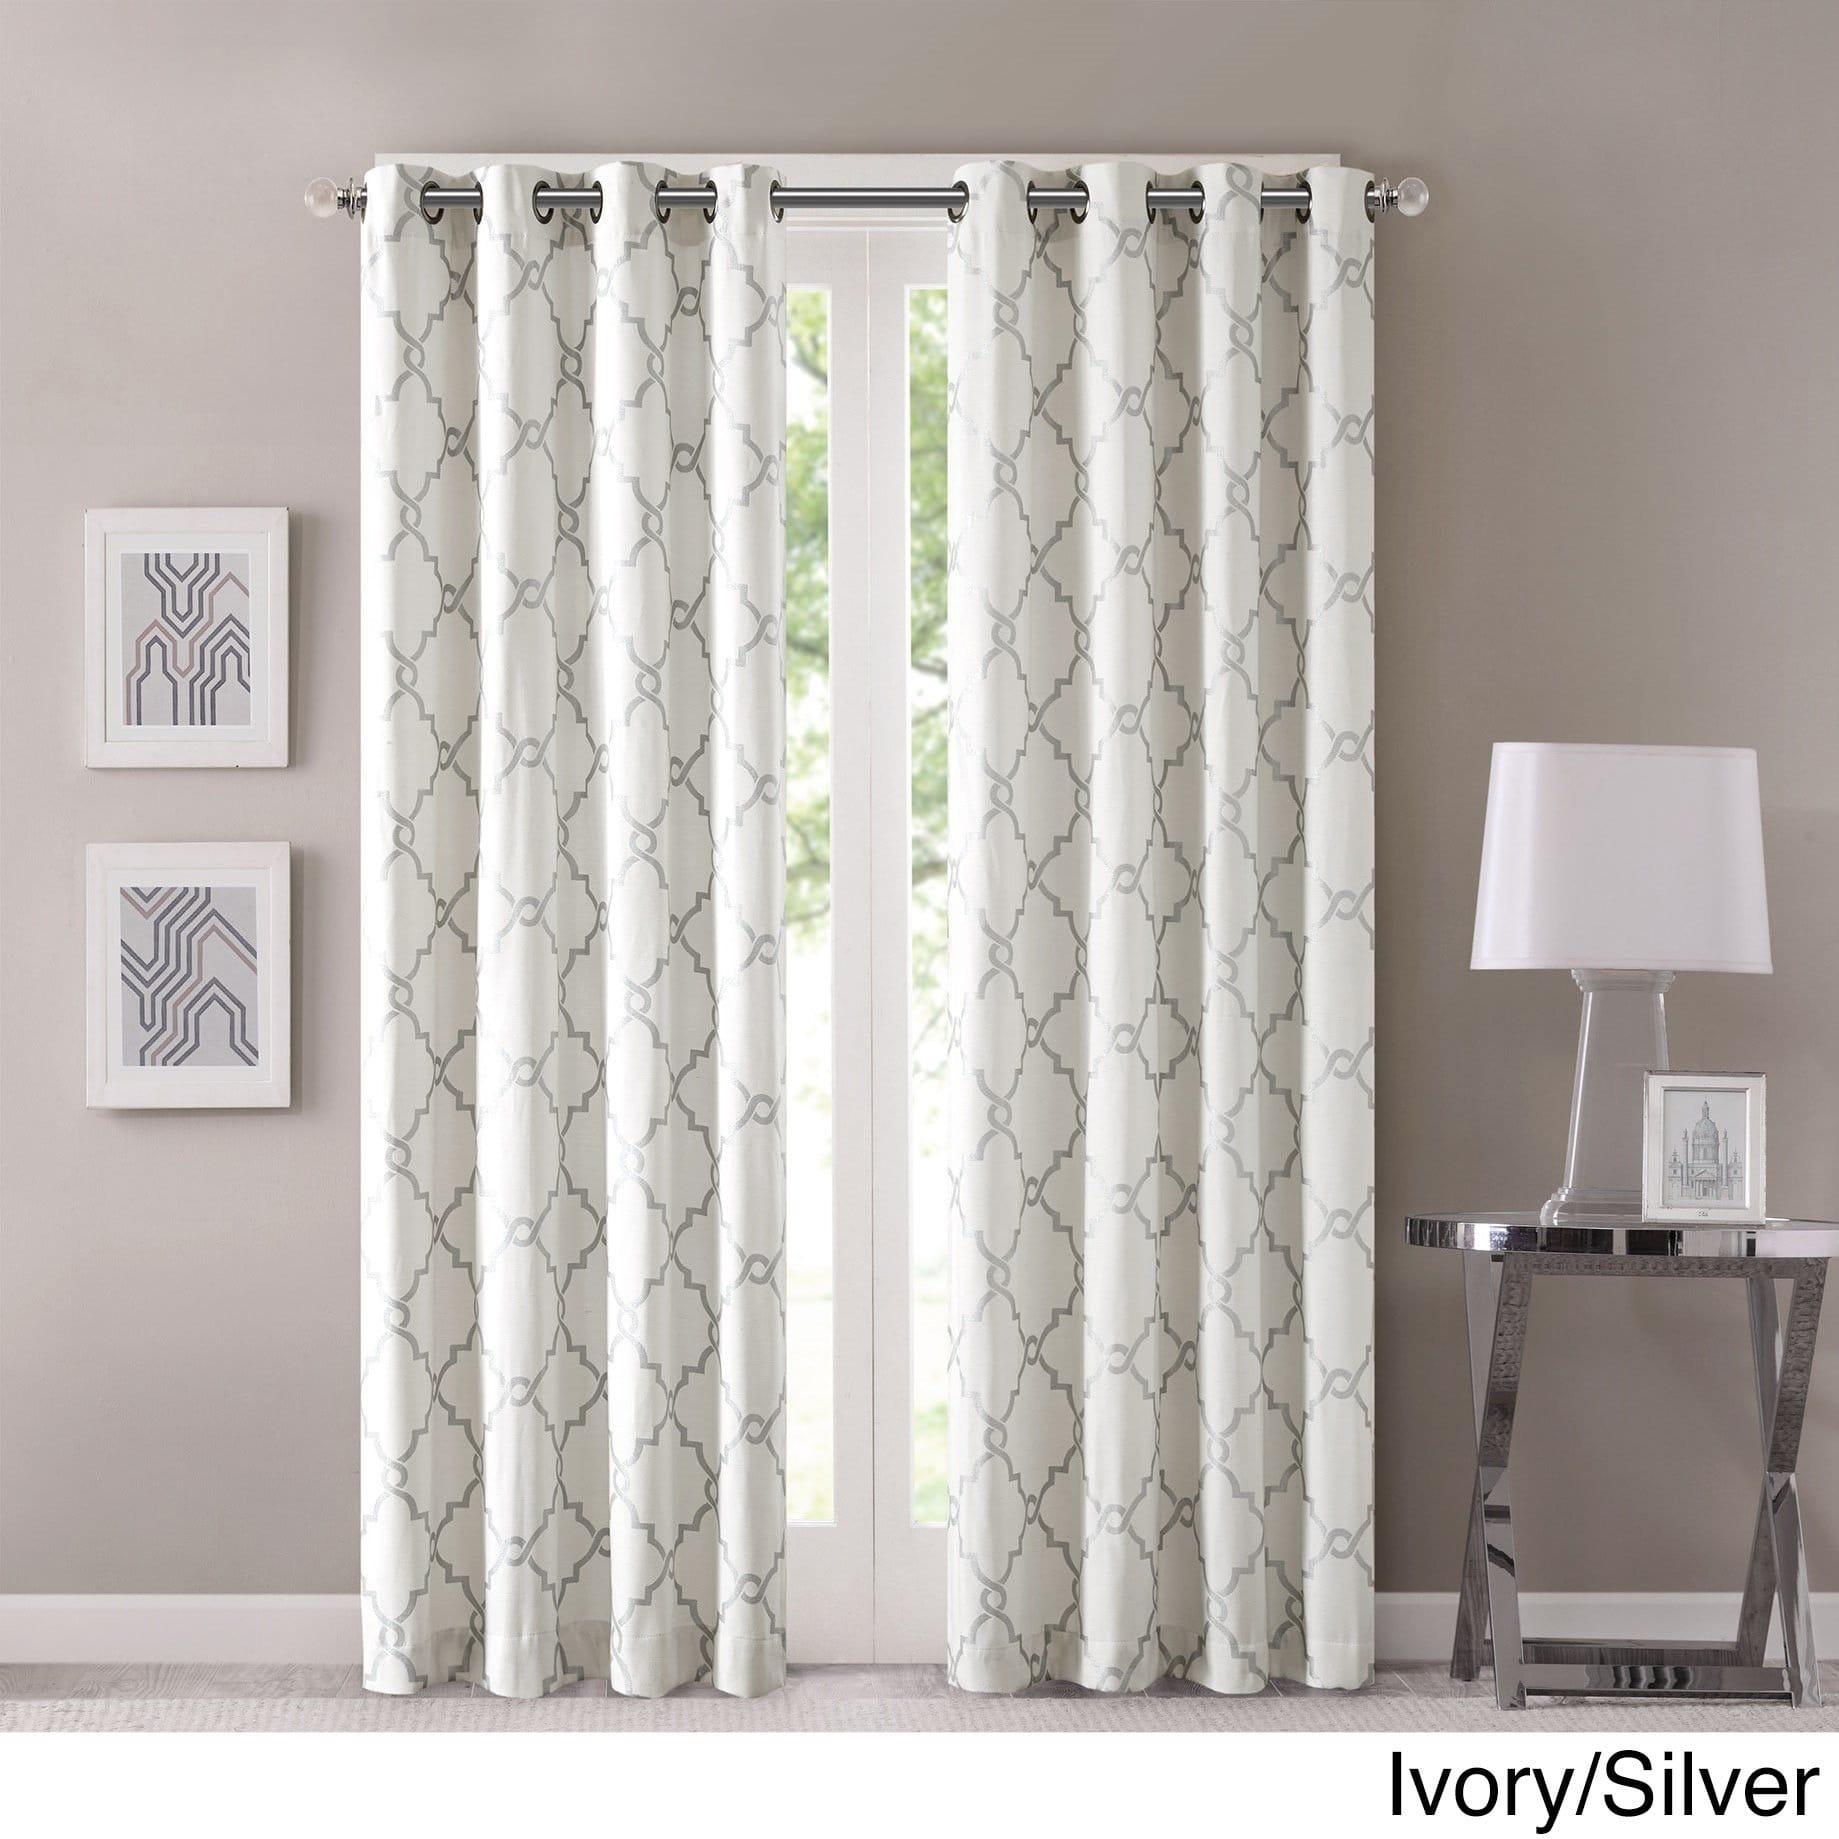 Madison Park Westmont Geometric Pattern Single Curtain Panel Pertaining To Fretwork Print Pattern Single Curtain Panels (View 5 of 20)